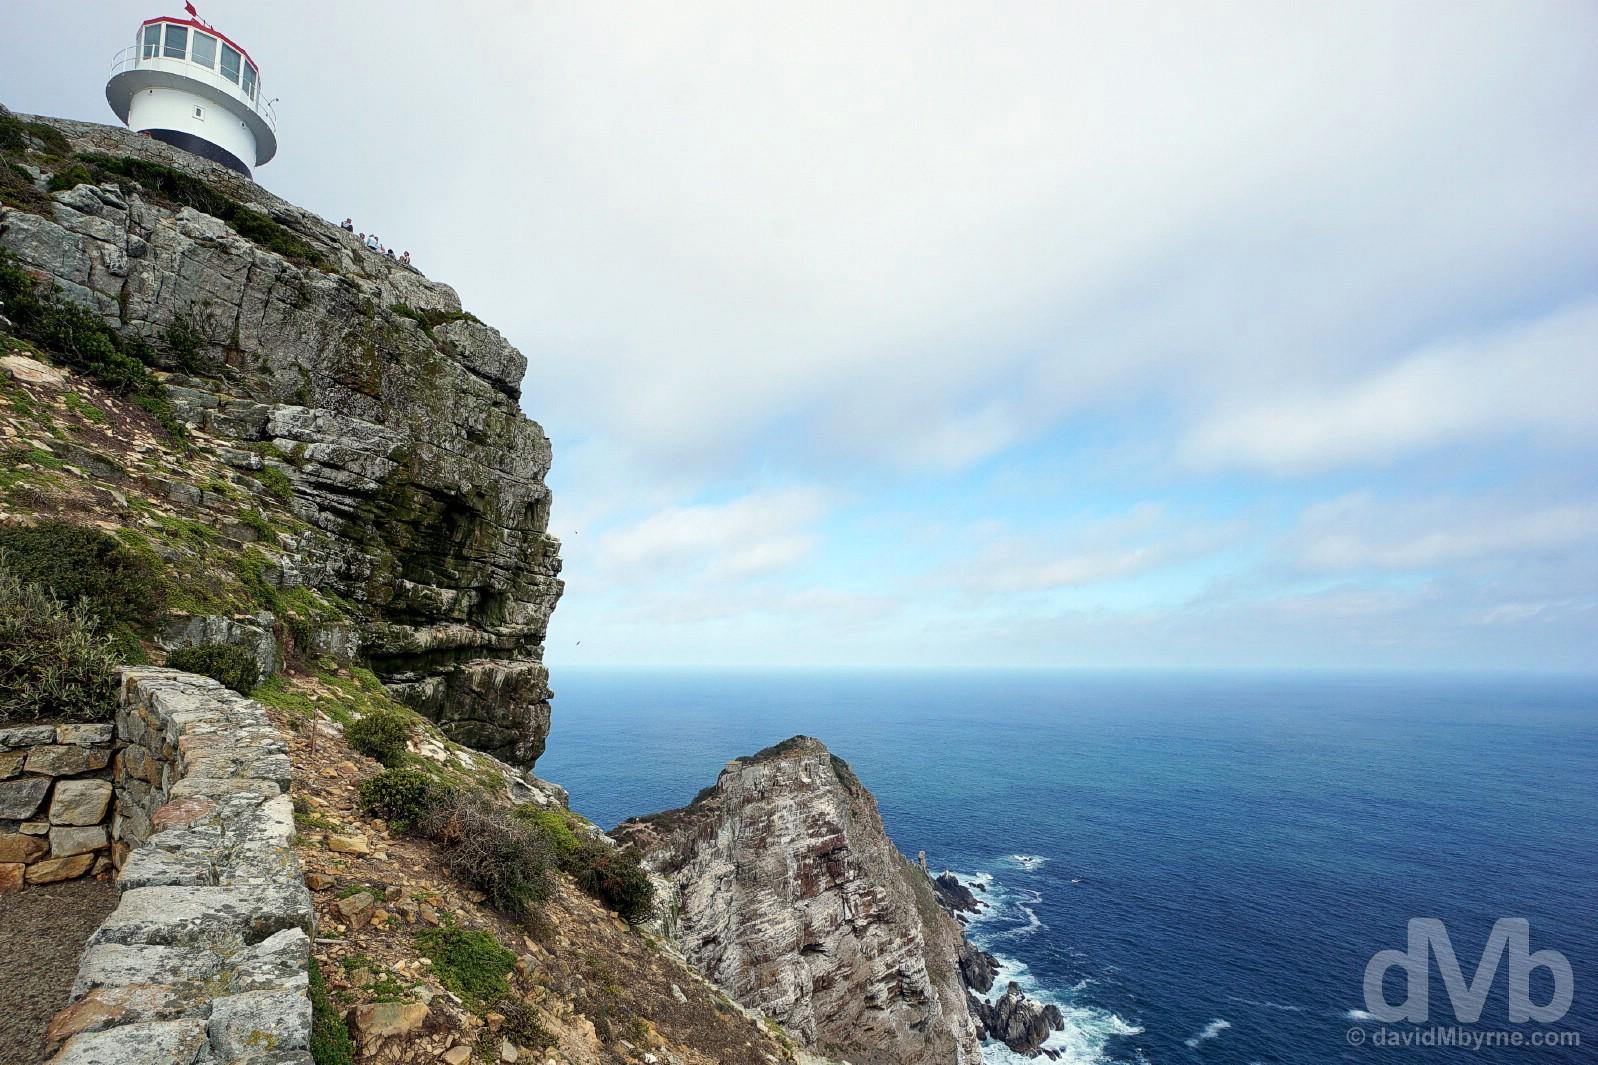 Cape Point, Cape Peninsula, Western Cape, South Africa. February 17, 2017.